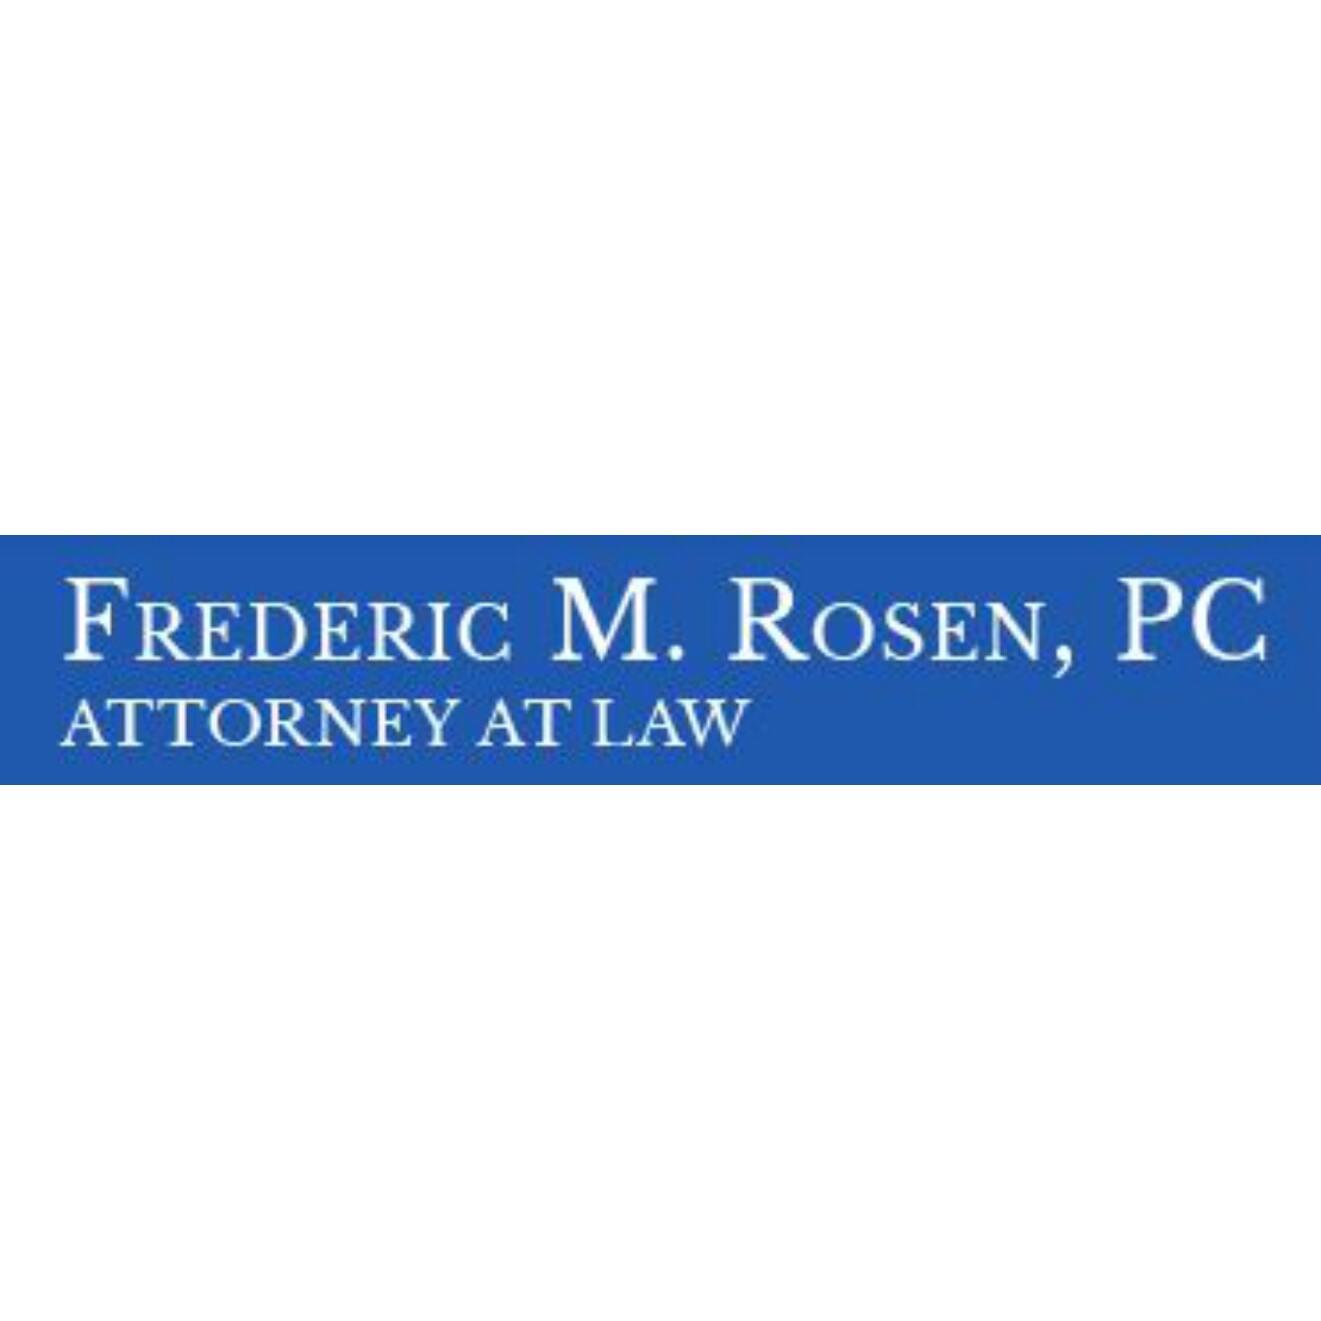 Frederic M Rosen PC